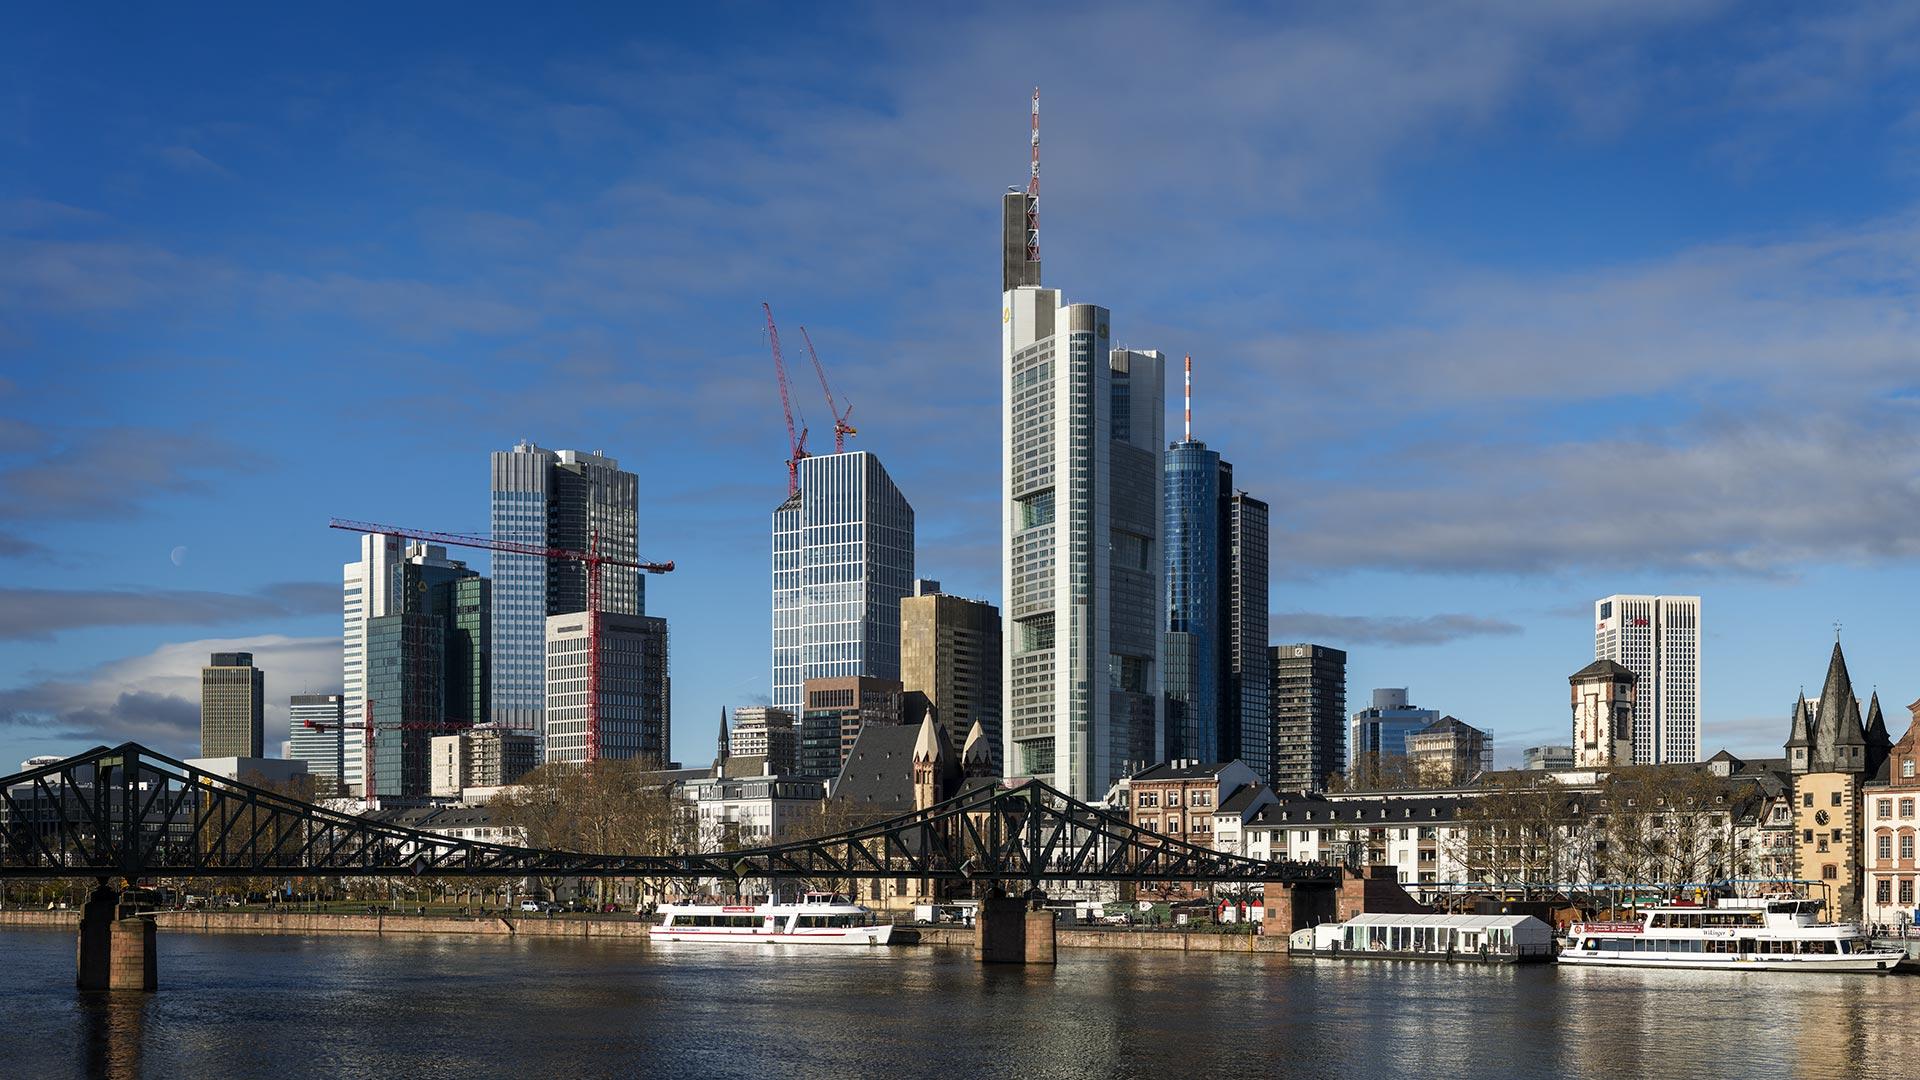 Skyline Frankfurt am Main 2013 – PanoTwins